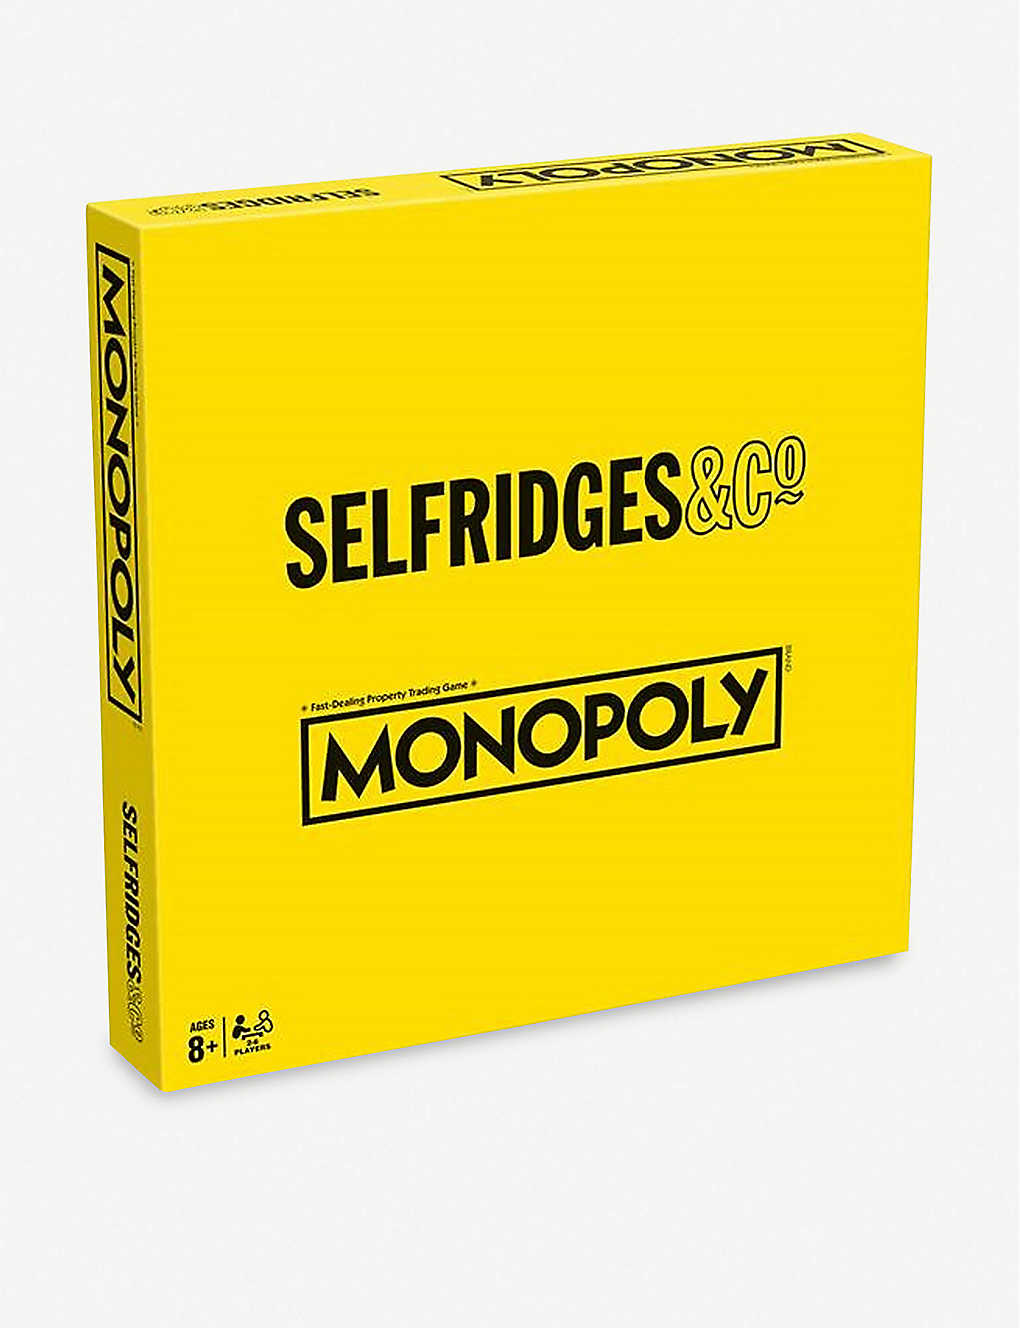 Selfridges exclusive Monopoly